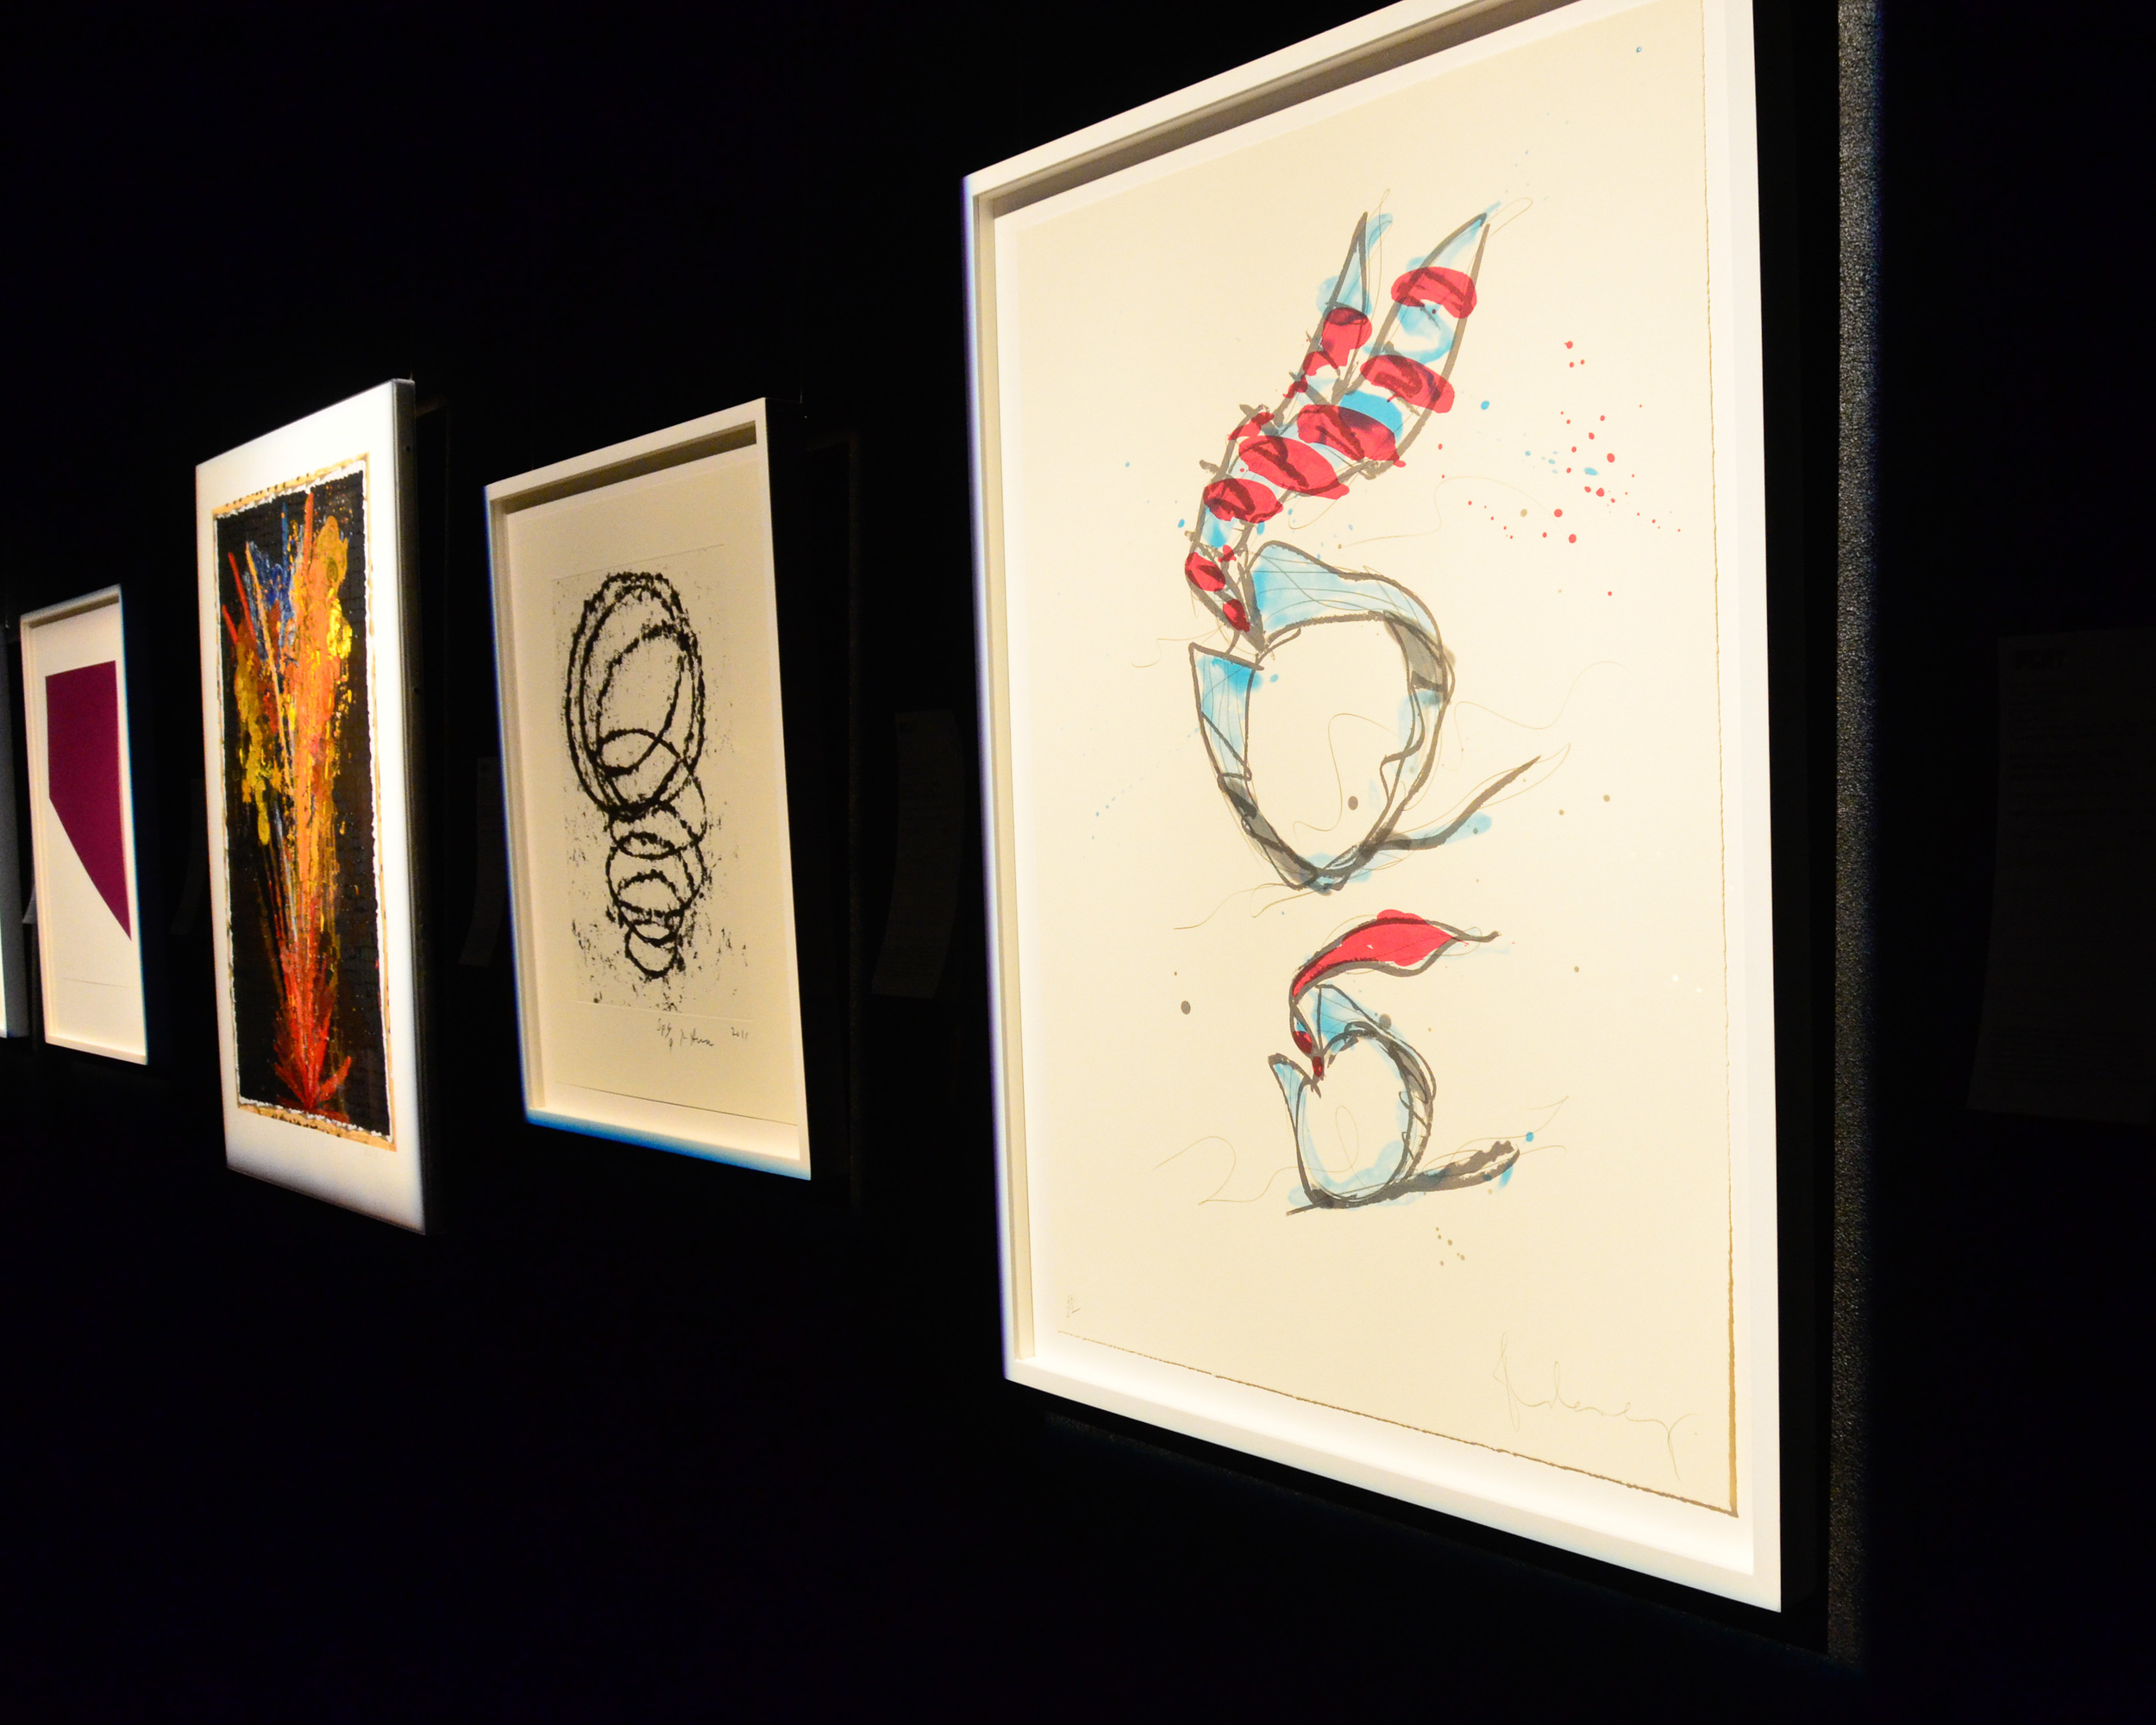 Art Auction to benefit International Print Center NY